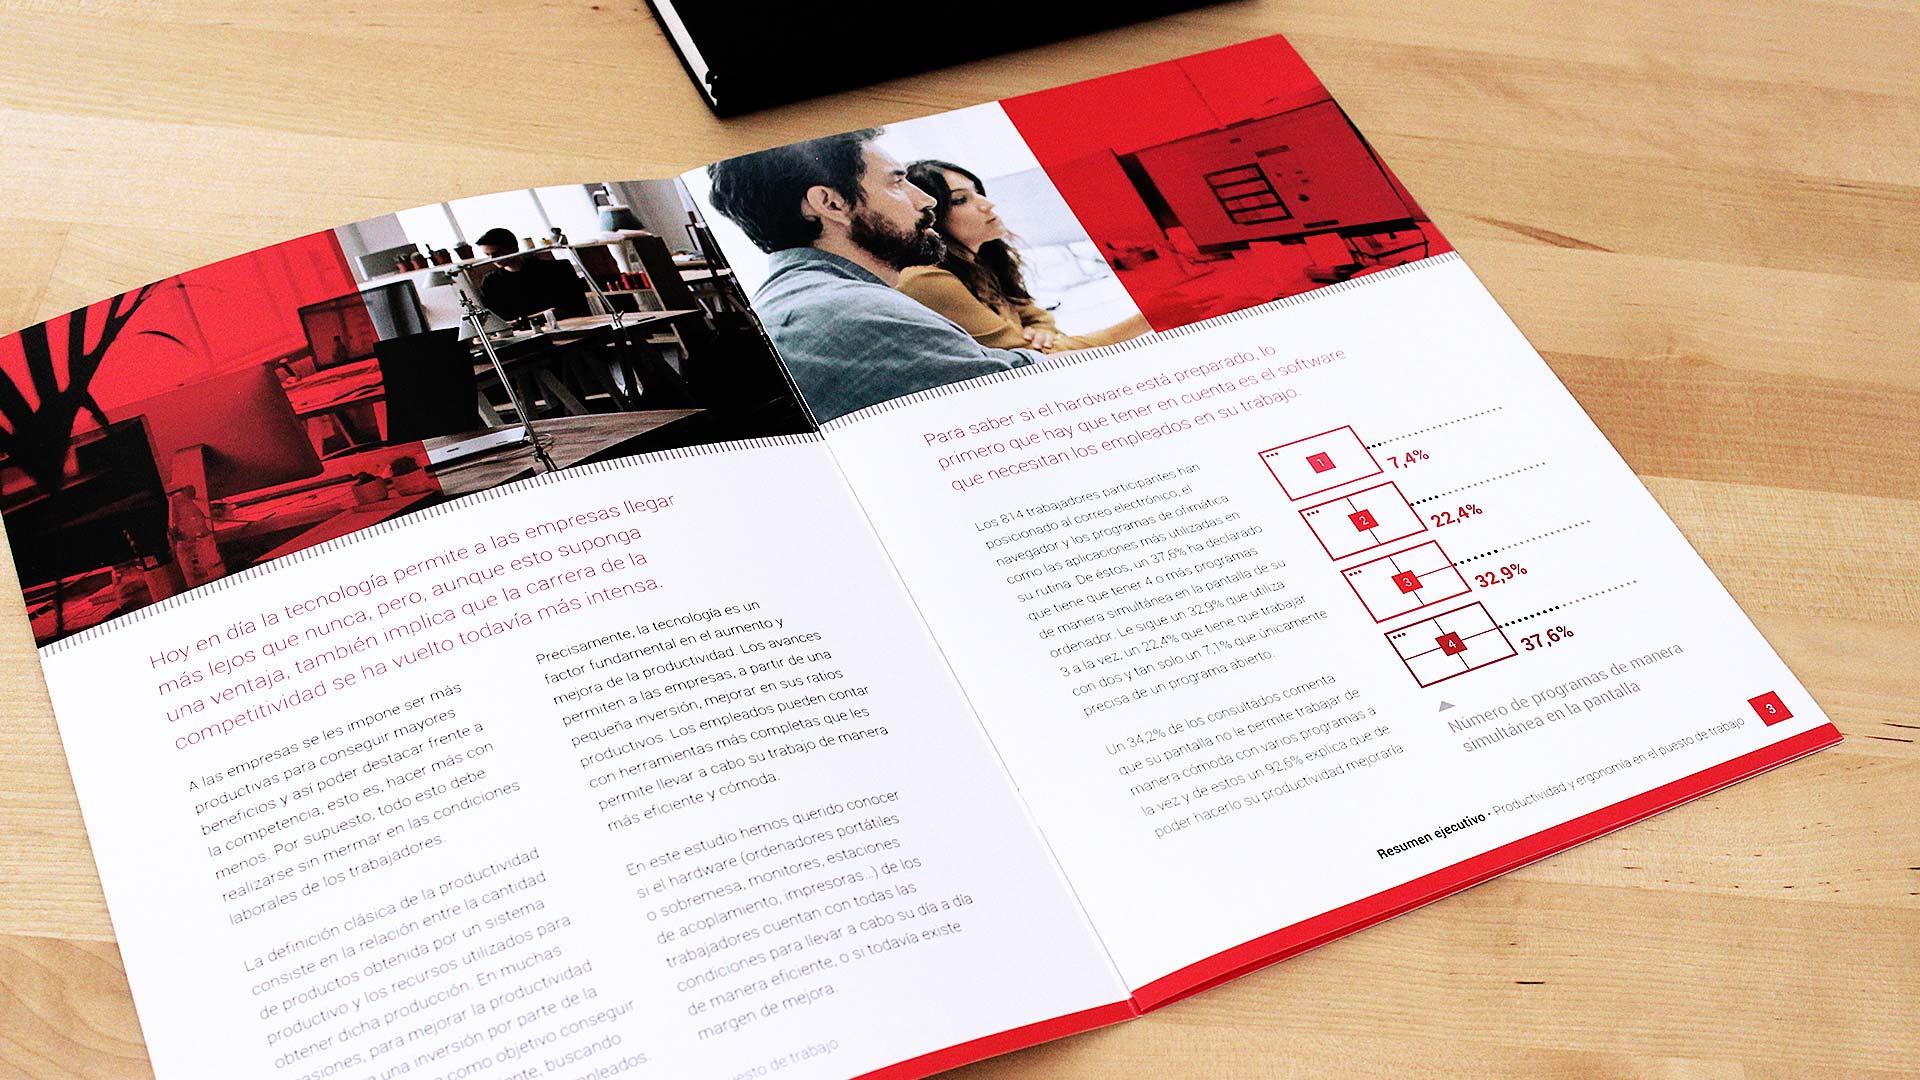 LG--content-marketing-informe-resumen-ejecutivo-ebook-ergonomia--2017_04